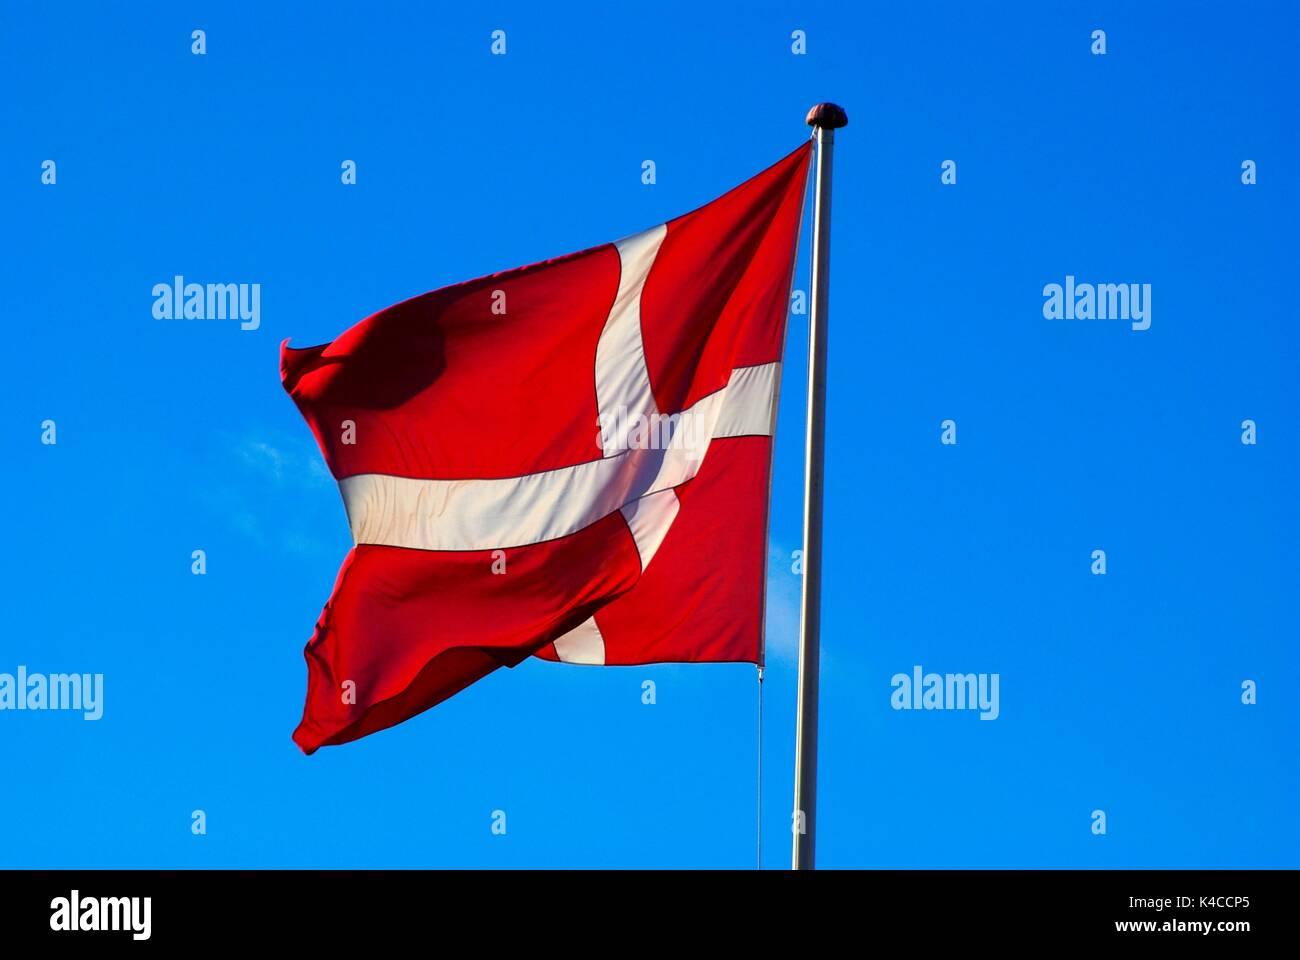 Danebrock, Dannebrog, Flag - Stock Image